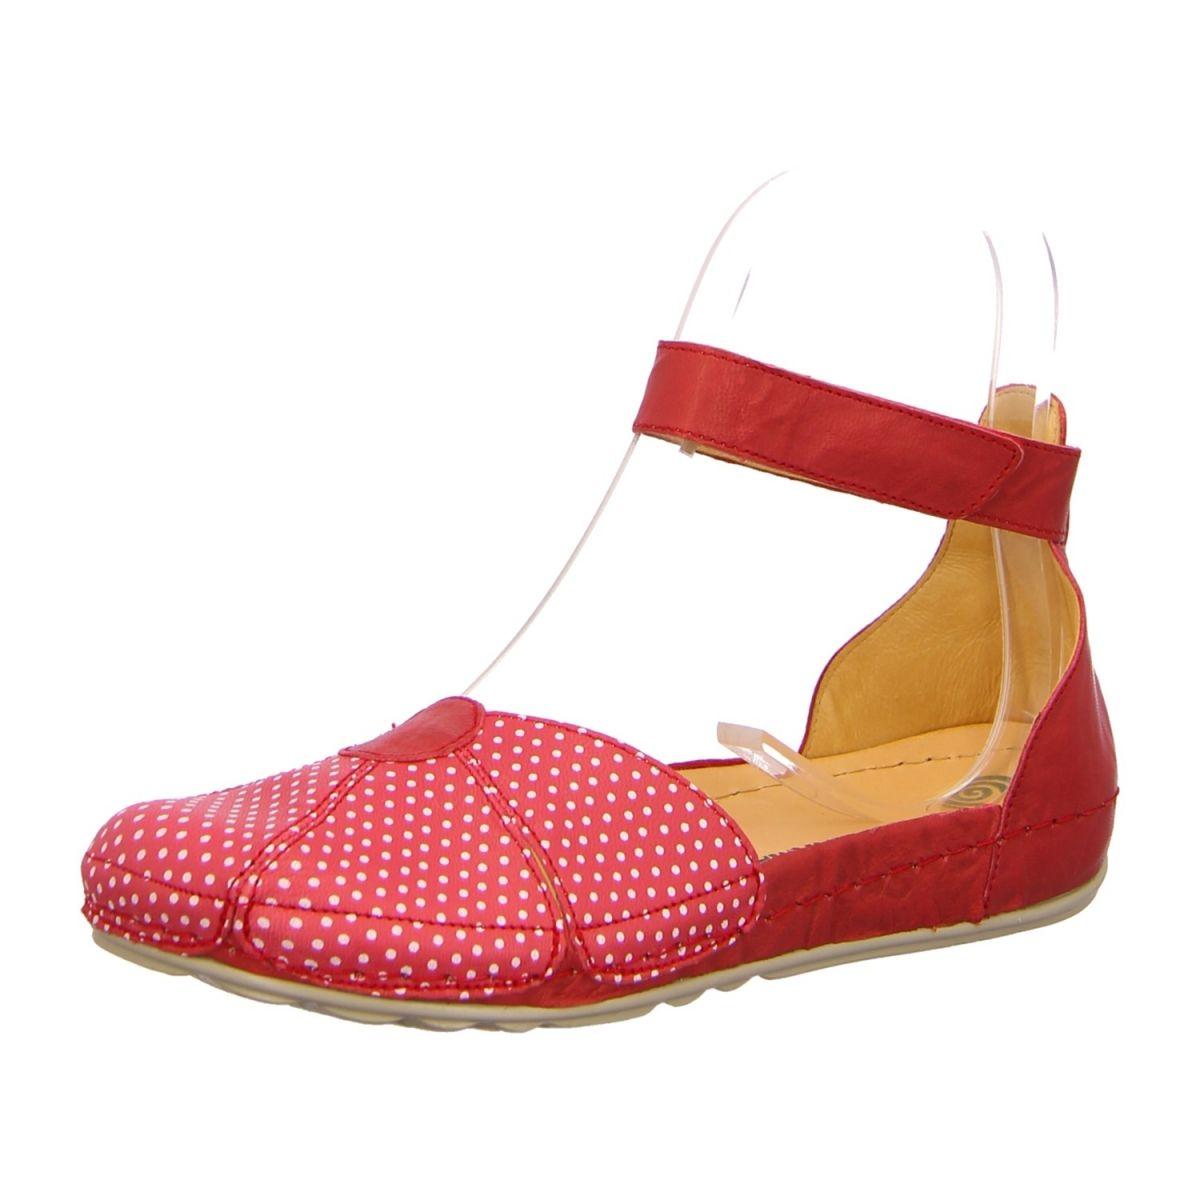 NEU: Dr. Brinkmann Ballerinas Sandalen 710772-4 - rot/punkte -